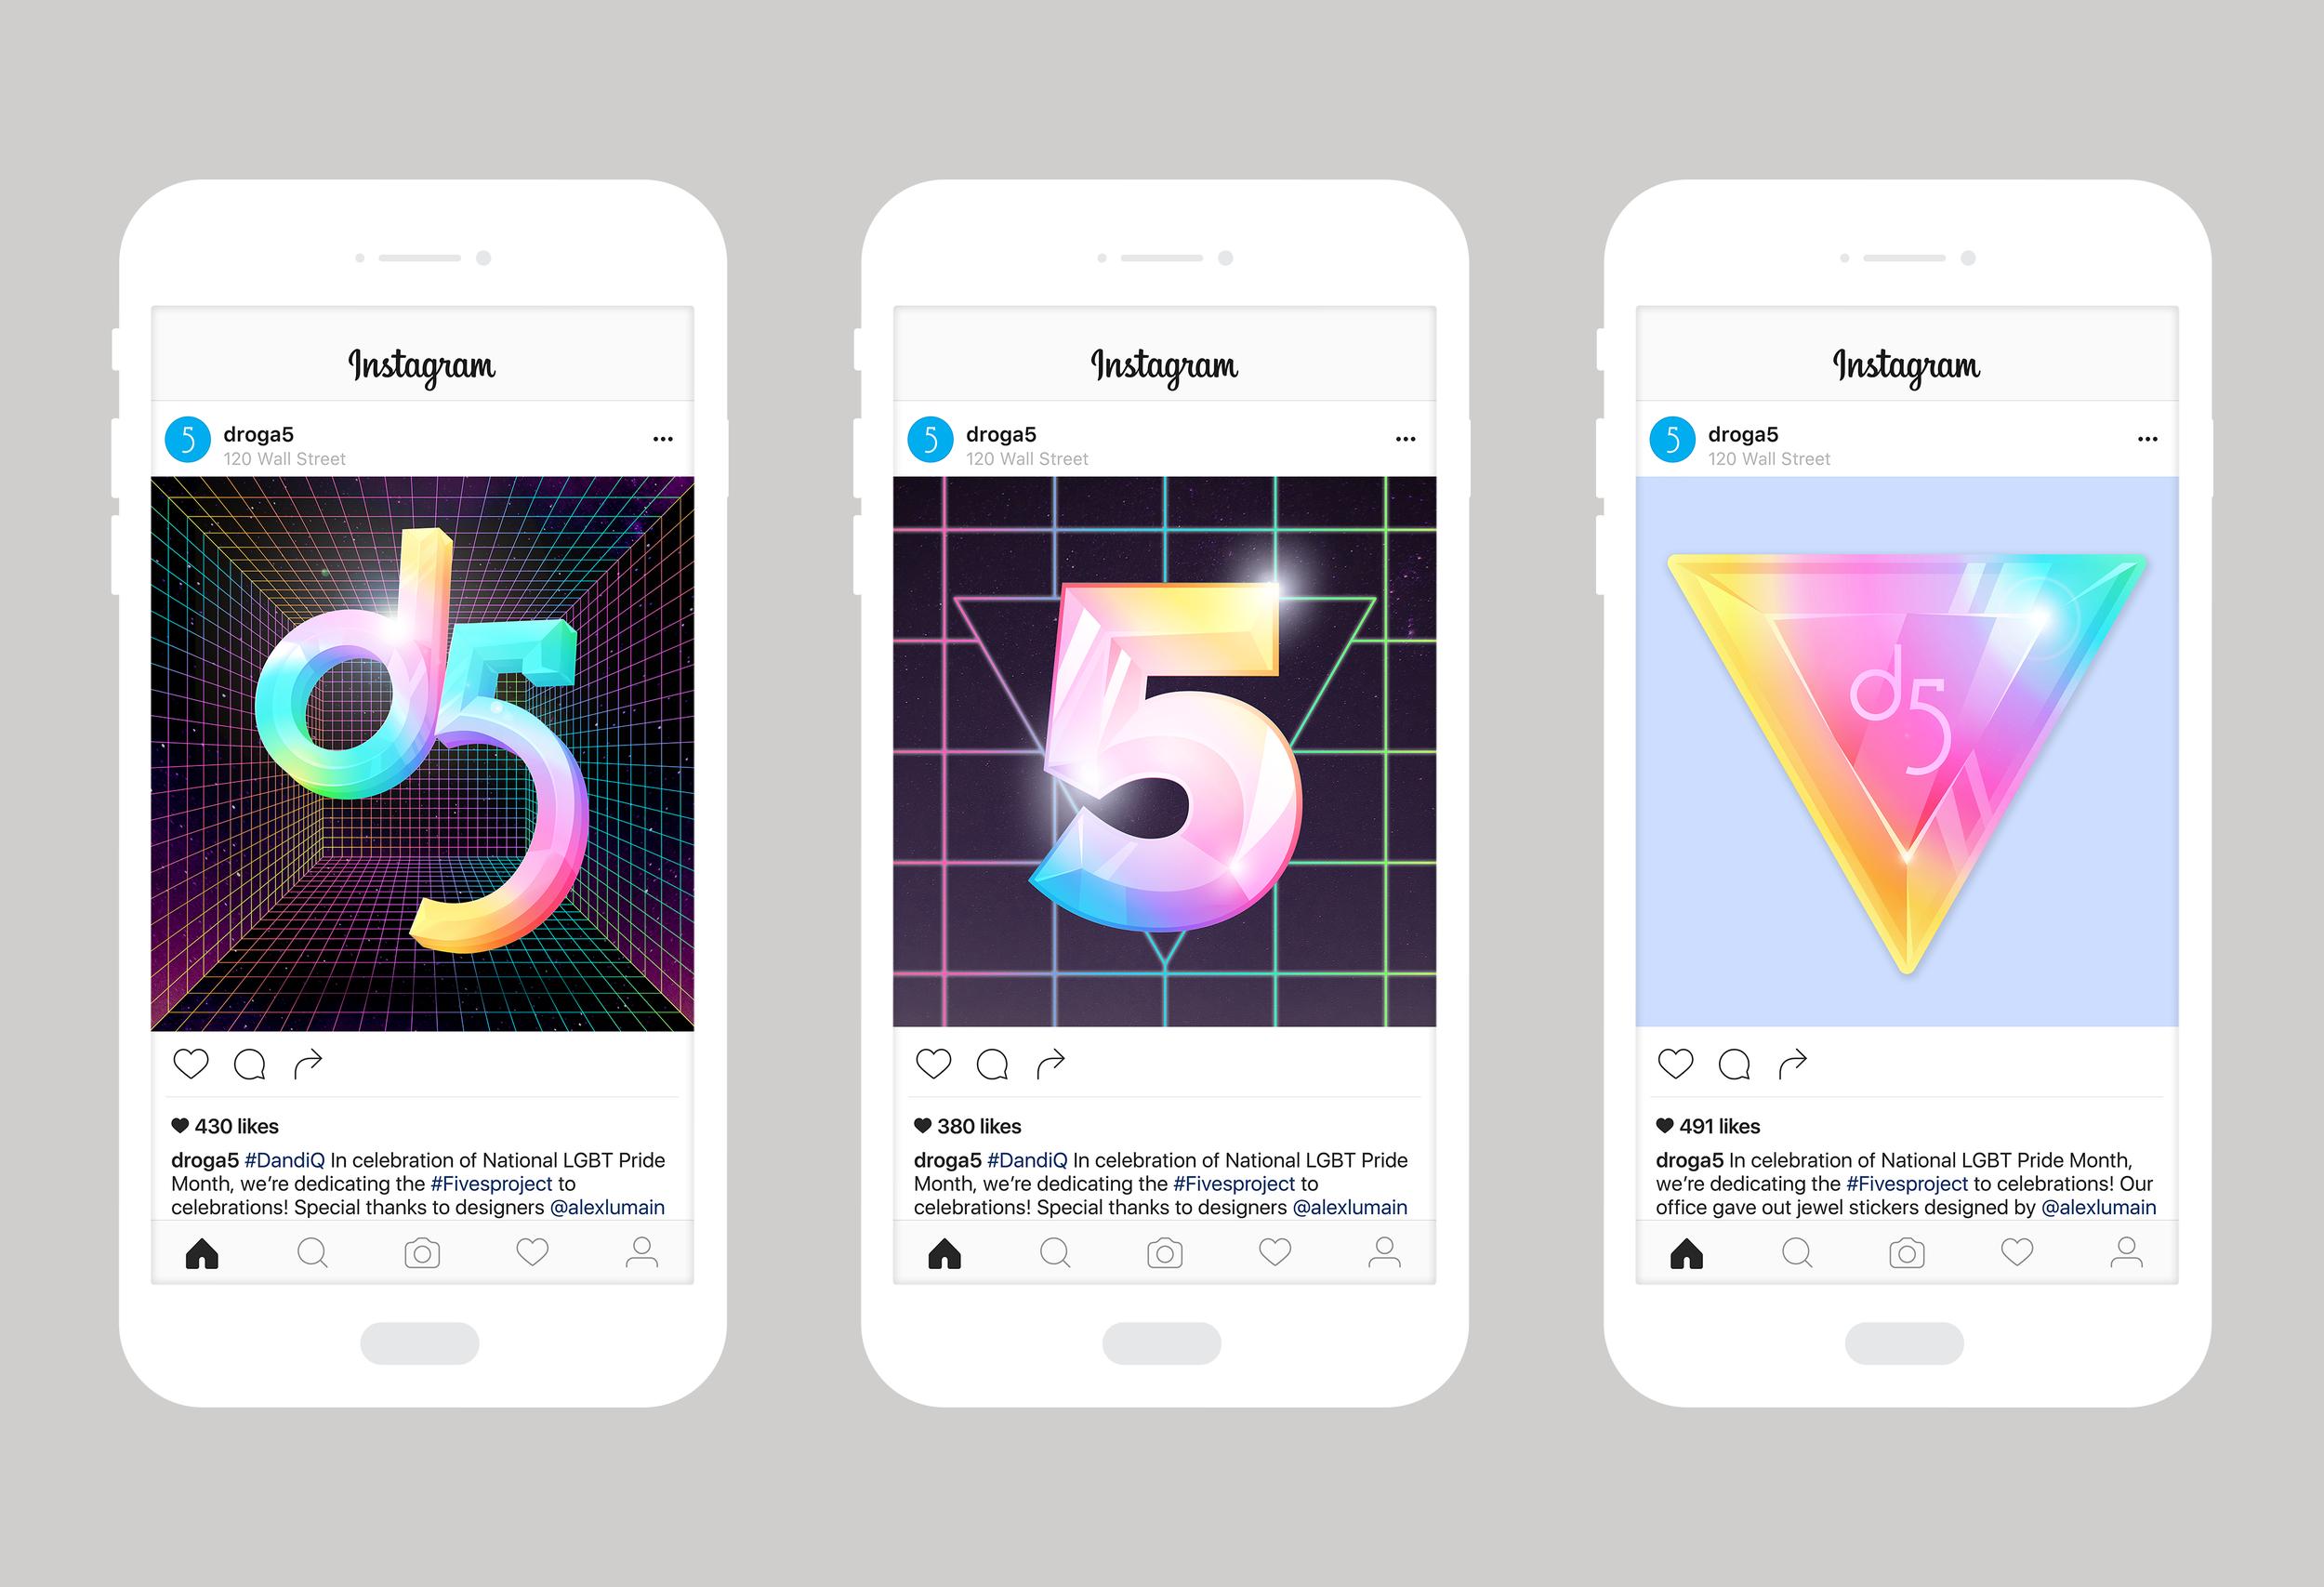 Social Posts I created for D5's Instagram in celebration of LGBT Pride Month